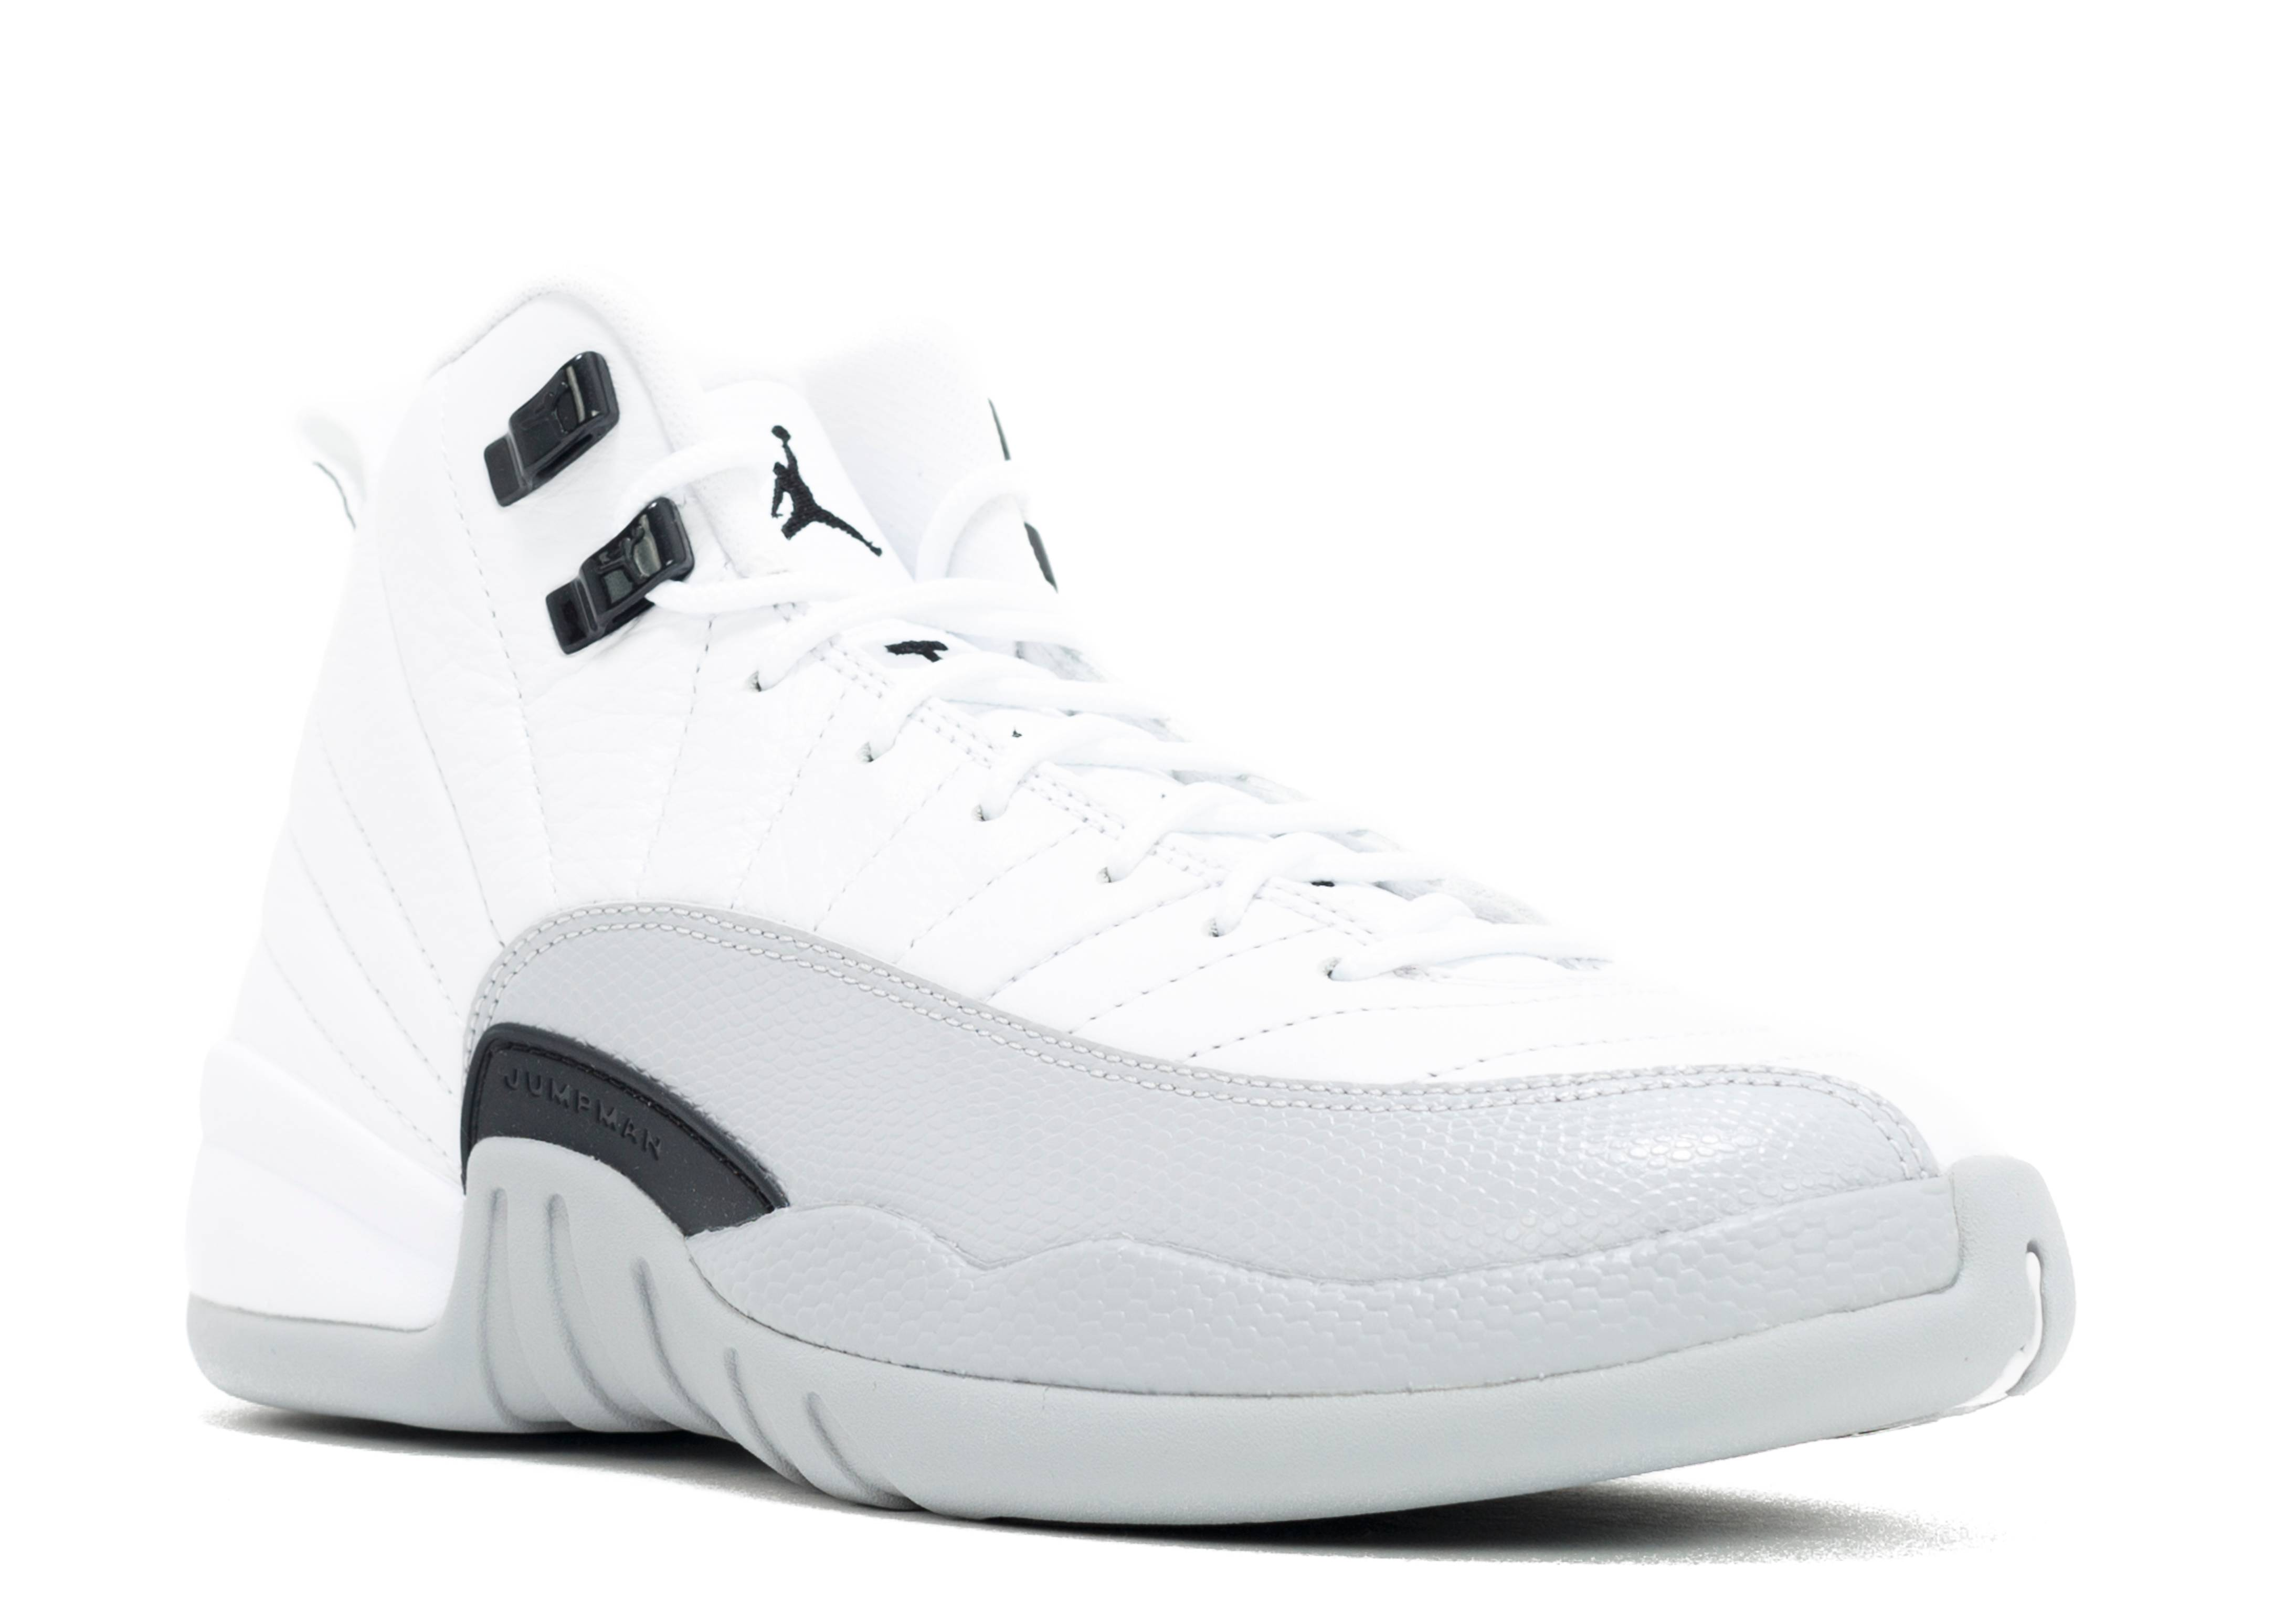 grey and white jordan 12